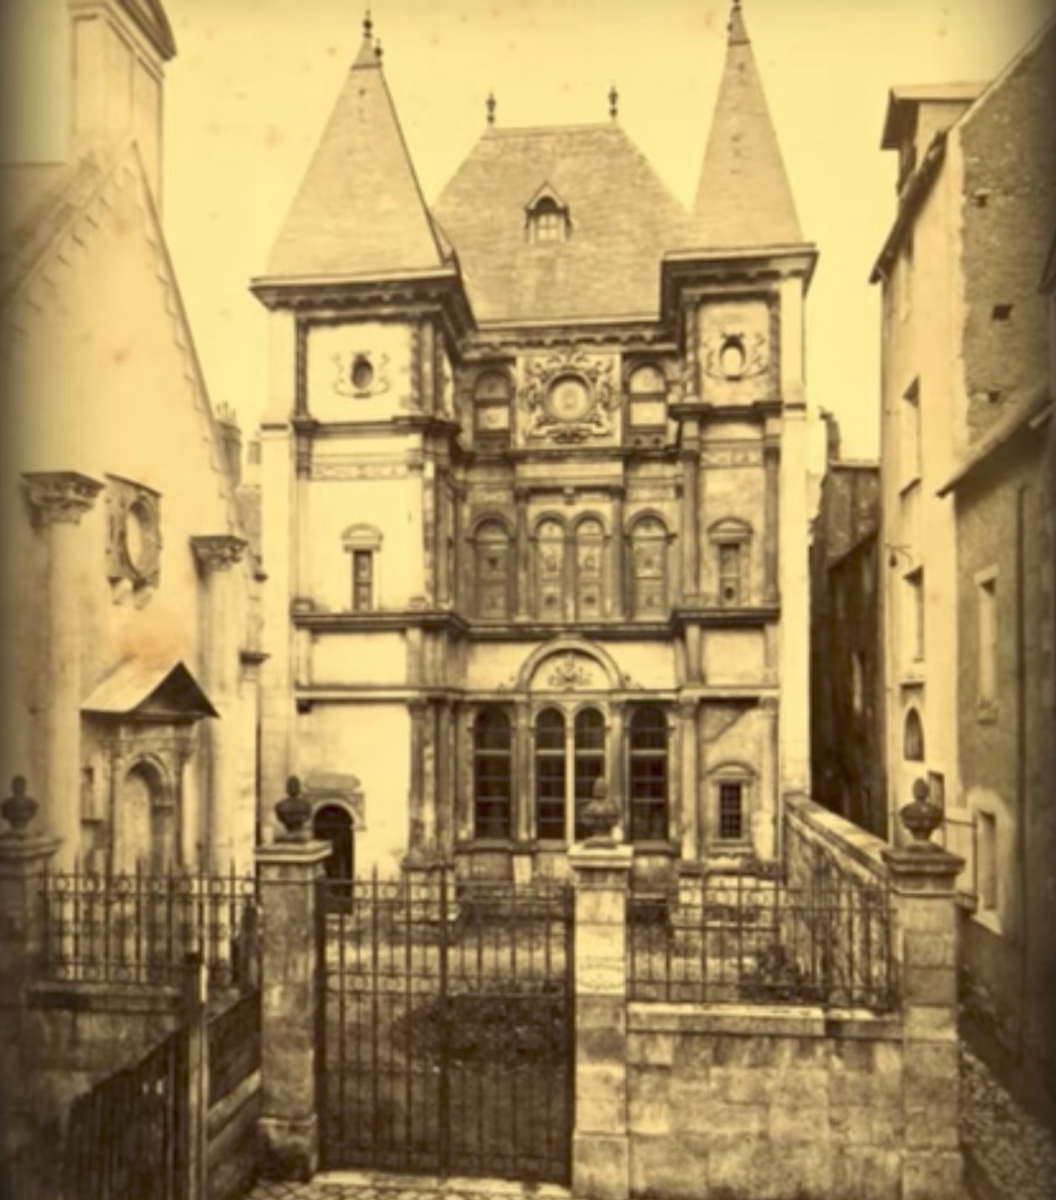 The Monnier home.